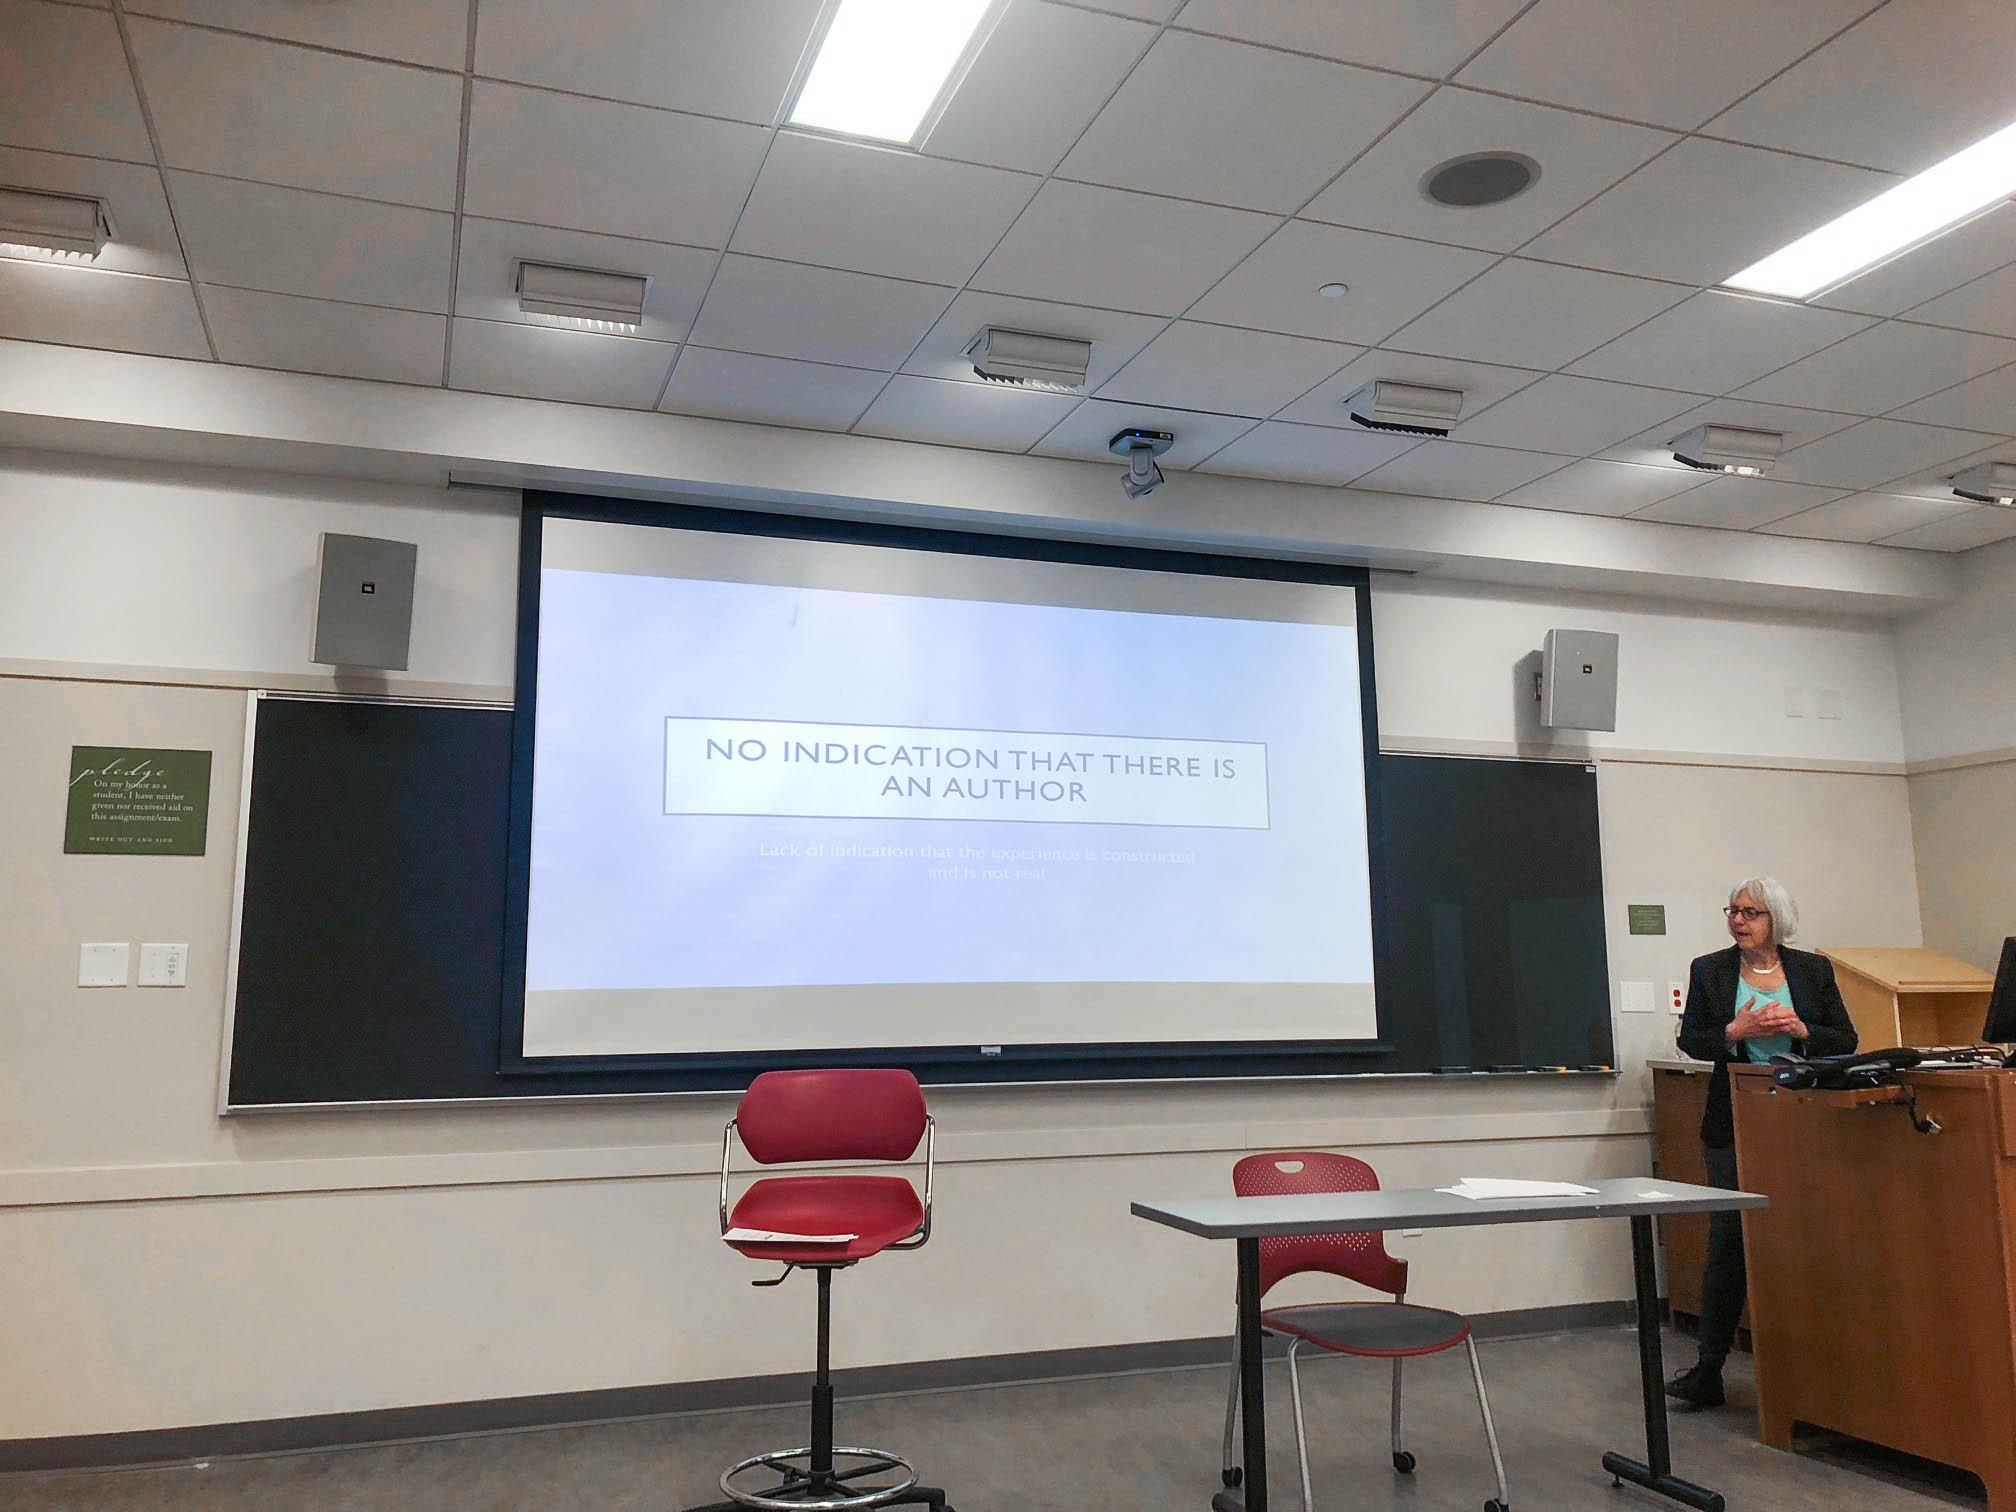 Deborah G. Johnson presenting her paper at Global Fusion 2018. When does empathic media cross the line? Image by Joakim Vindenes.